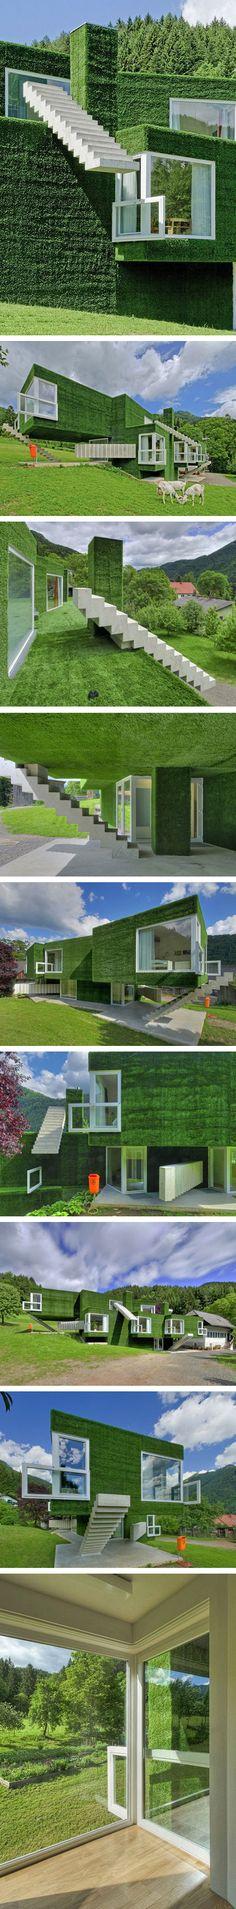 Green Architecture, Landscape Architecture, Vertical Green Wall, Astroturf, Eco Green, Unique Buildings, Vertical Gardens, House Landscape, Urban Farming